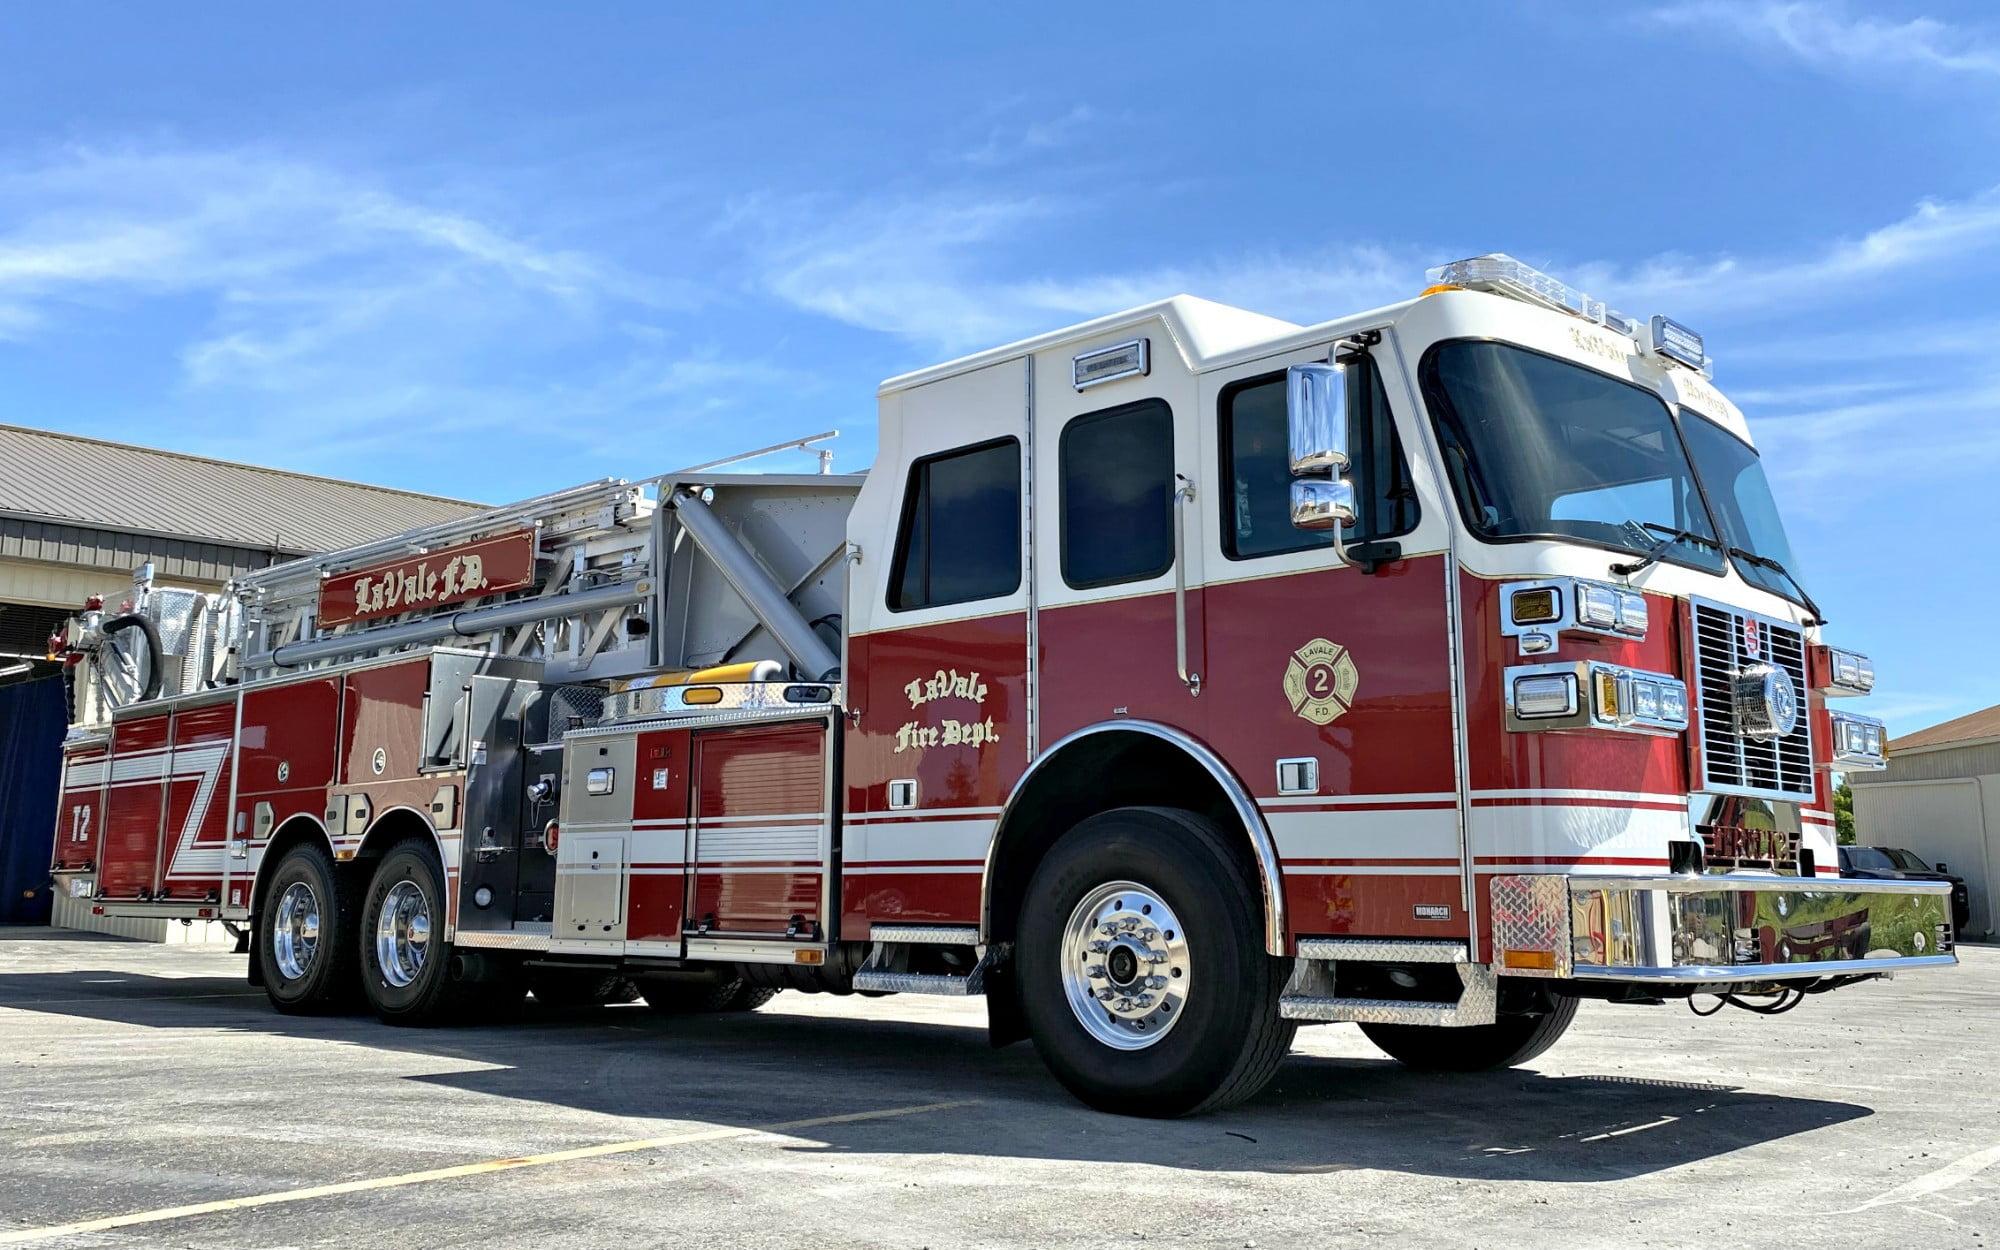 LaVale Fire Department